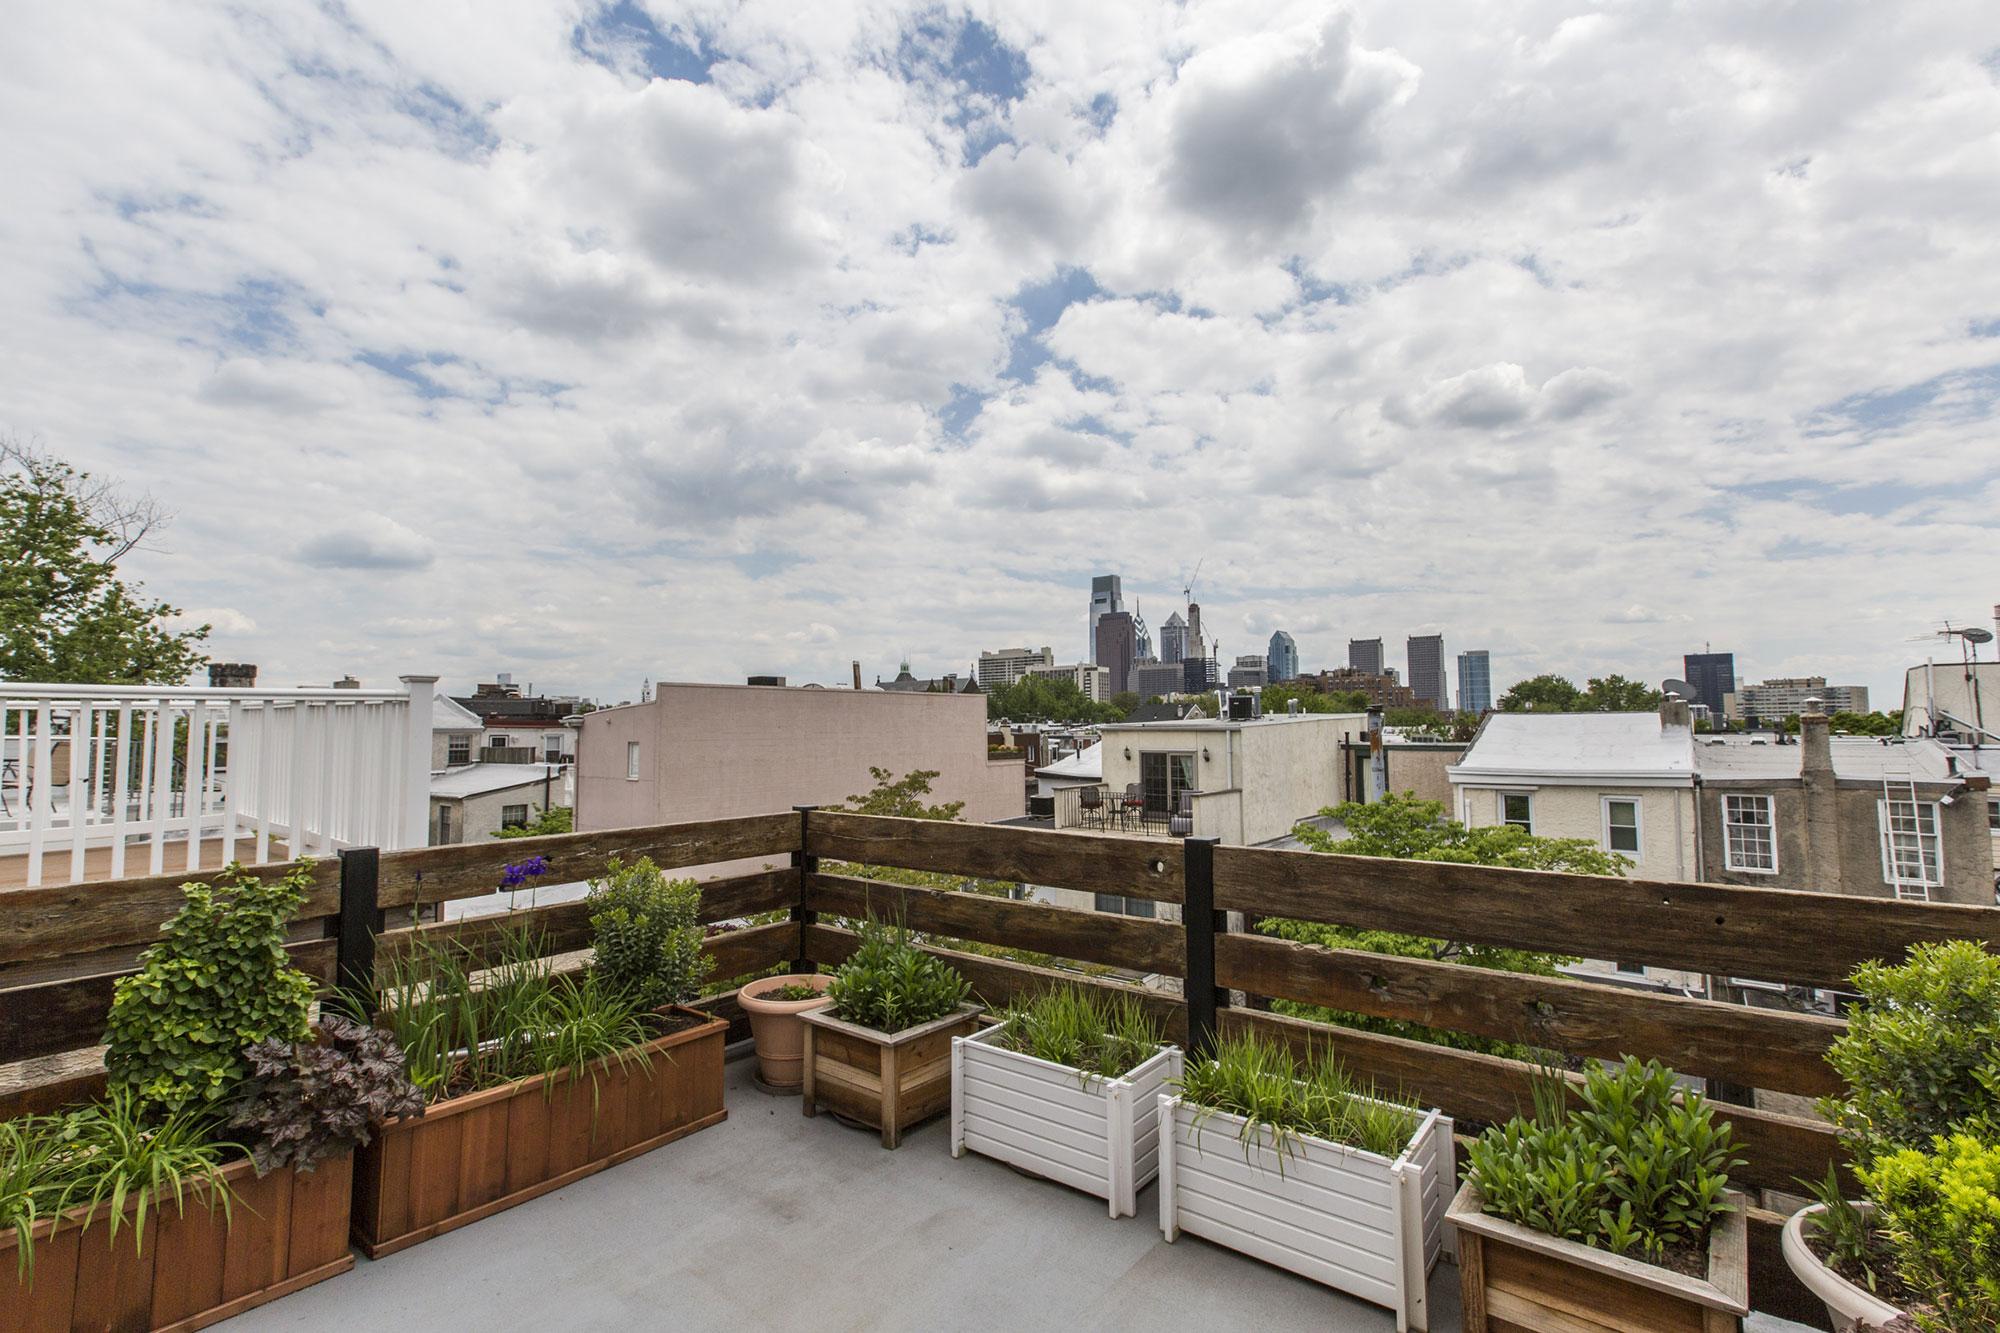 homes for sale in Philadelphia, PA